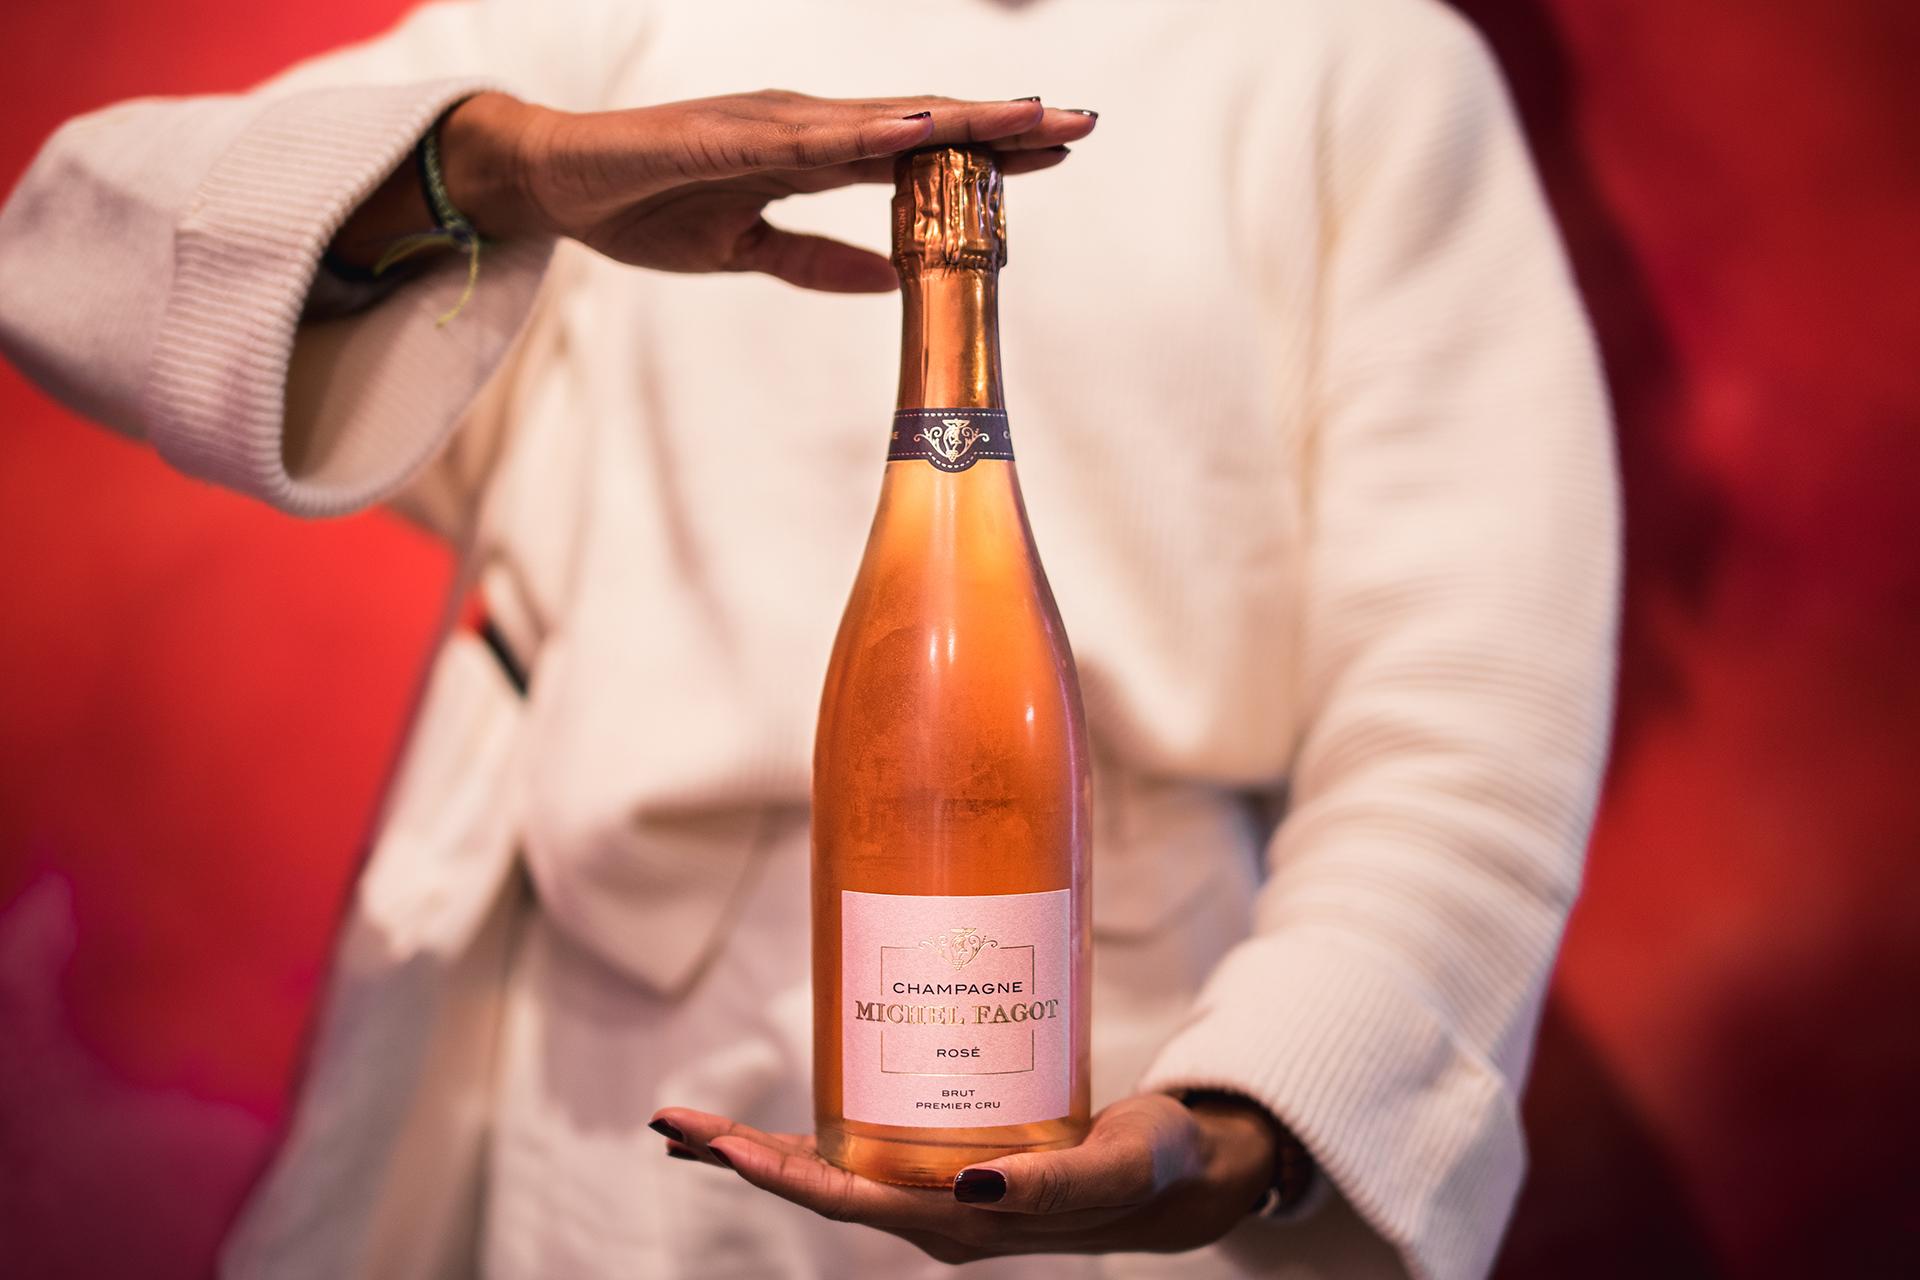 champagne-rose-fagot-michel